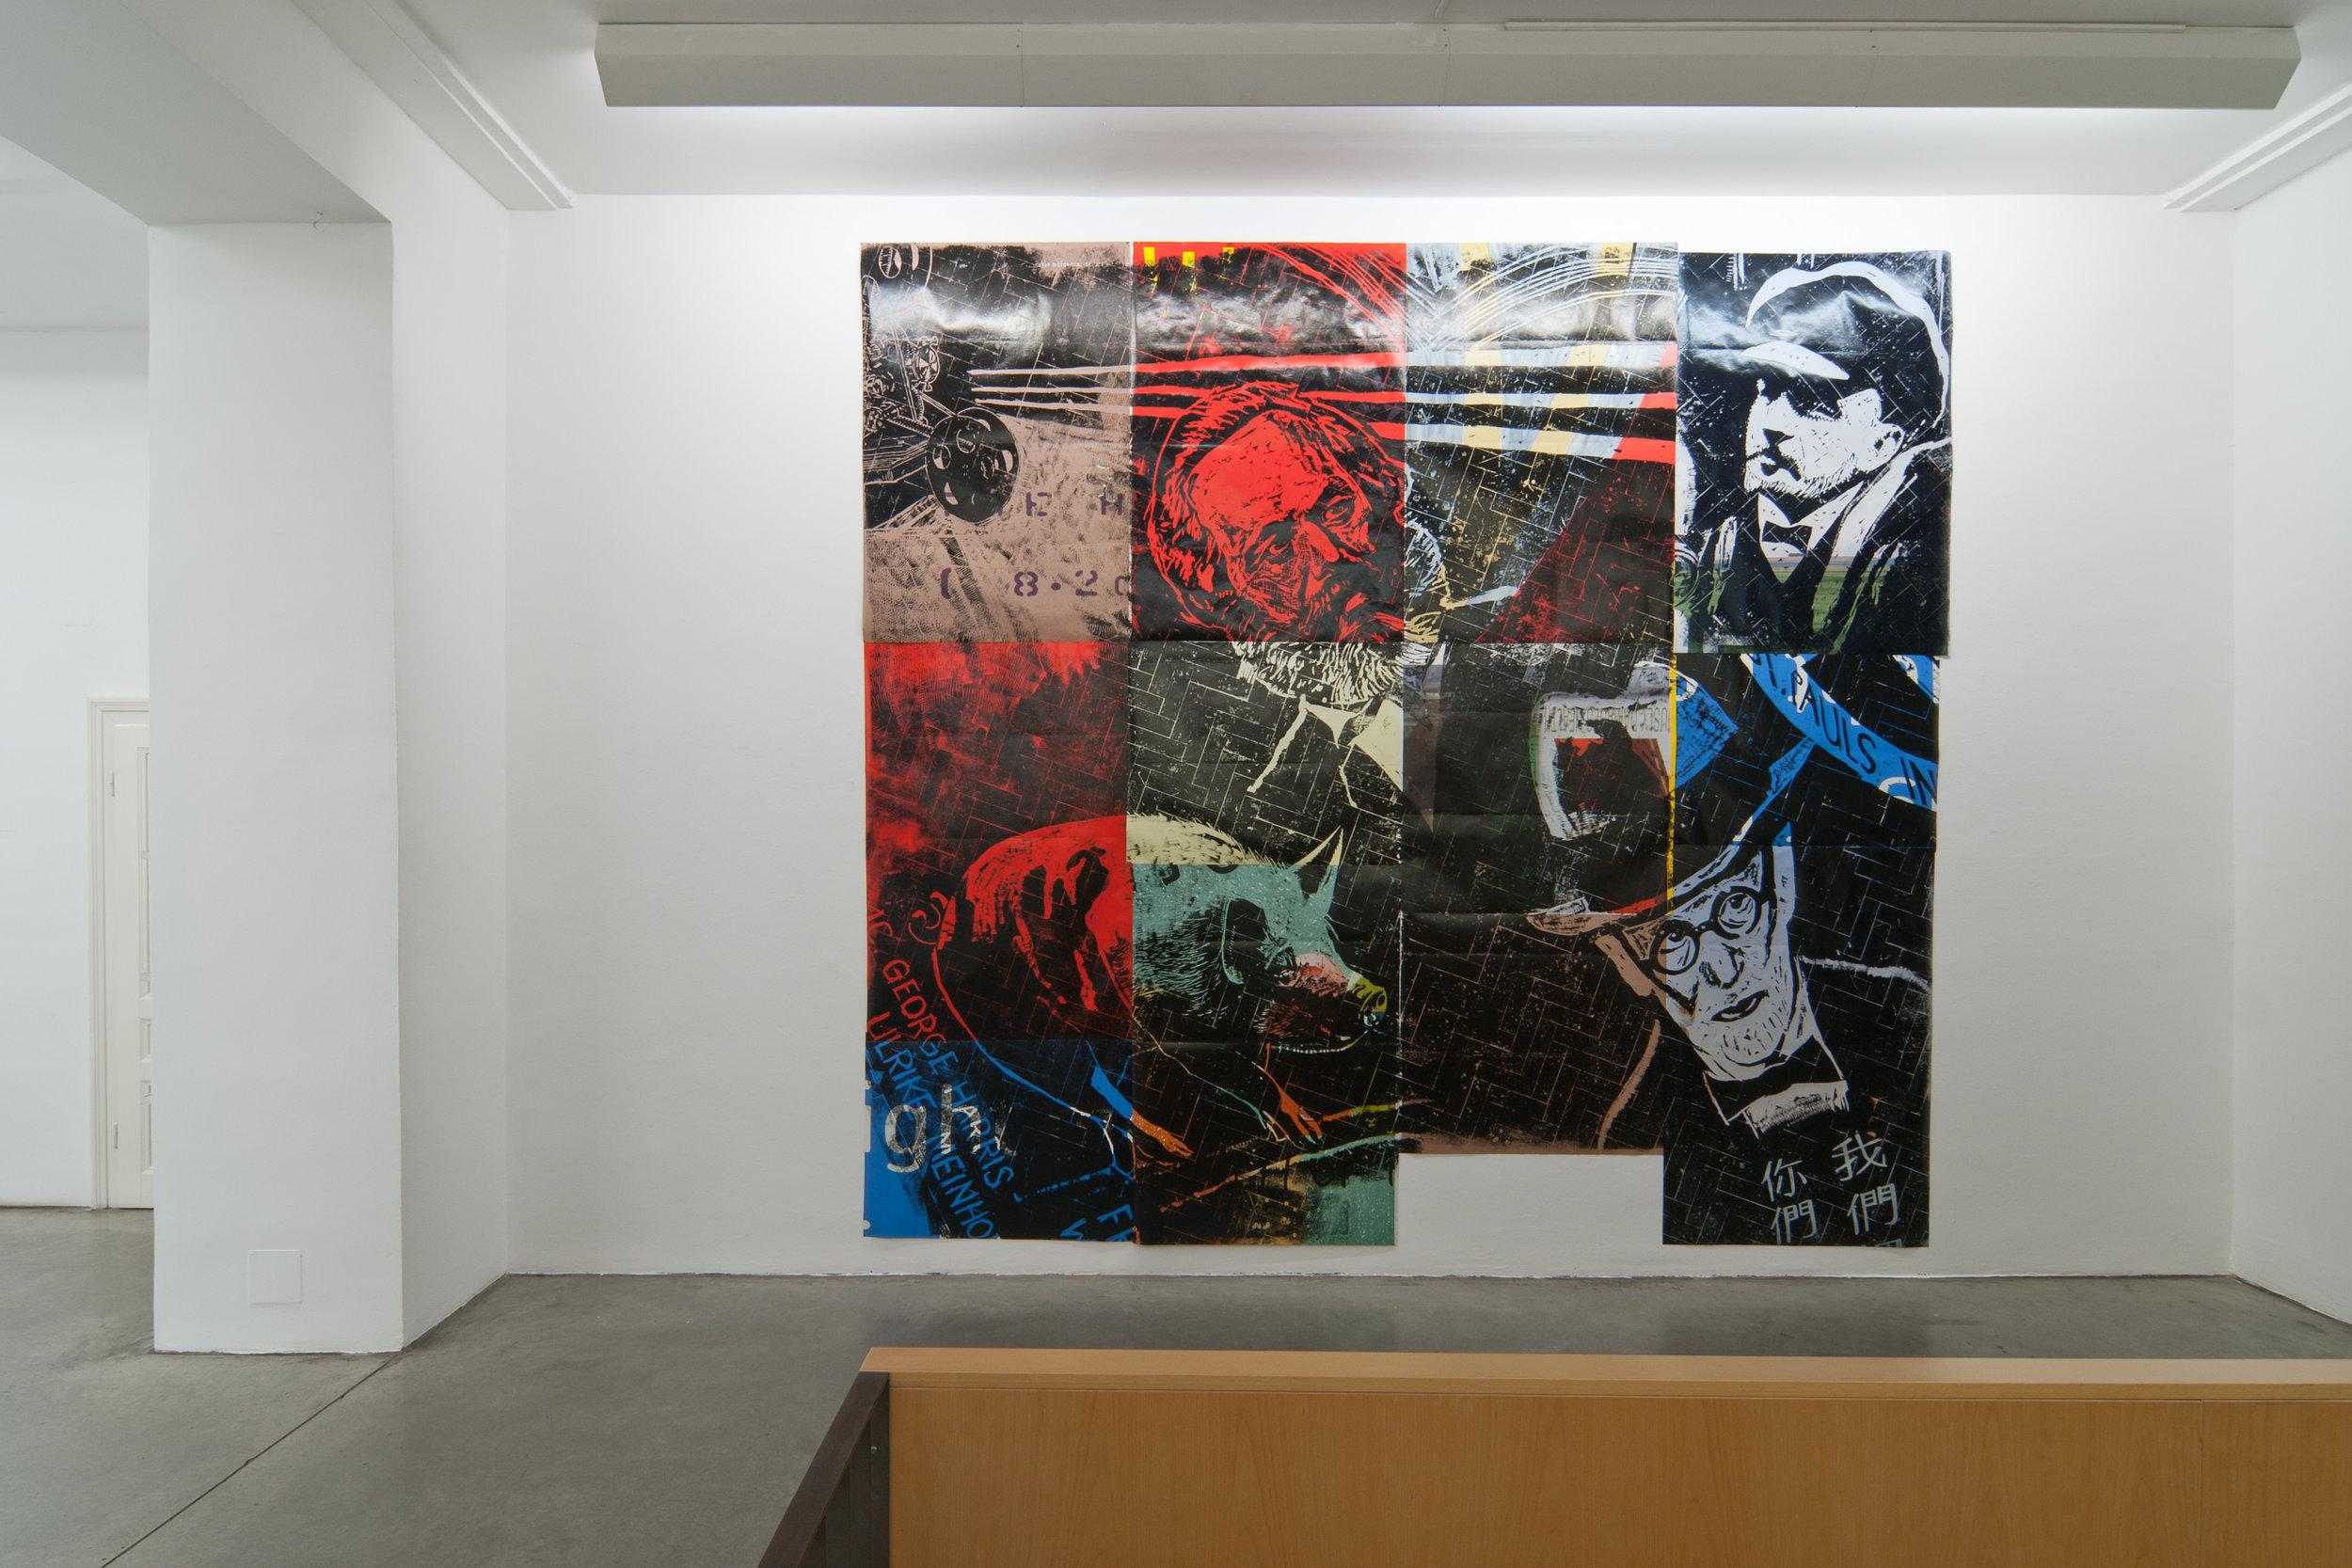 Exhibition View, Christine König Galerie, Thomas Kilpper | Jimmie Durham, curated by_Marius Babias, 2012, Photo: Christine König Galerie